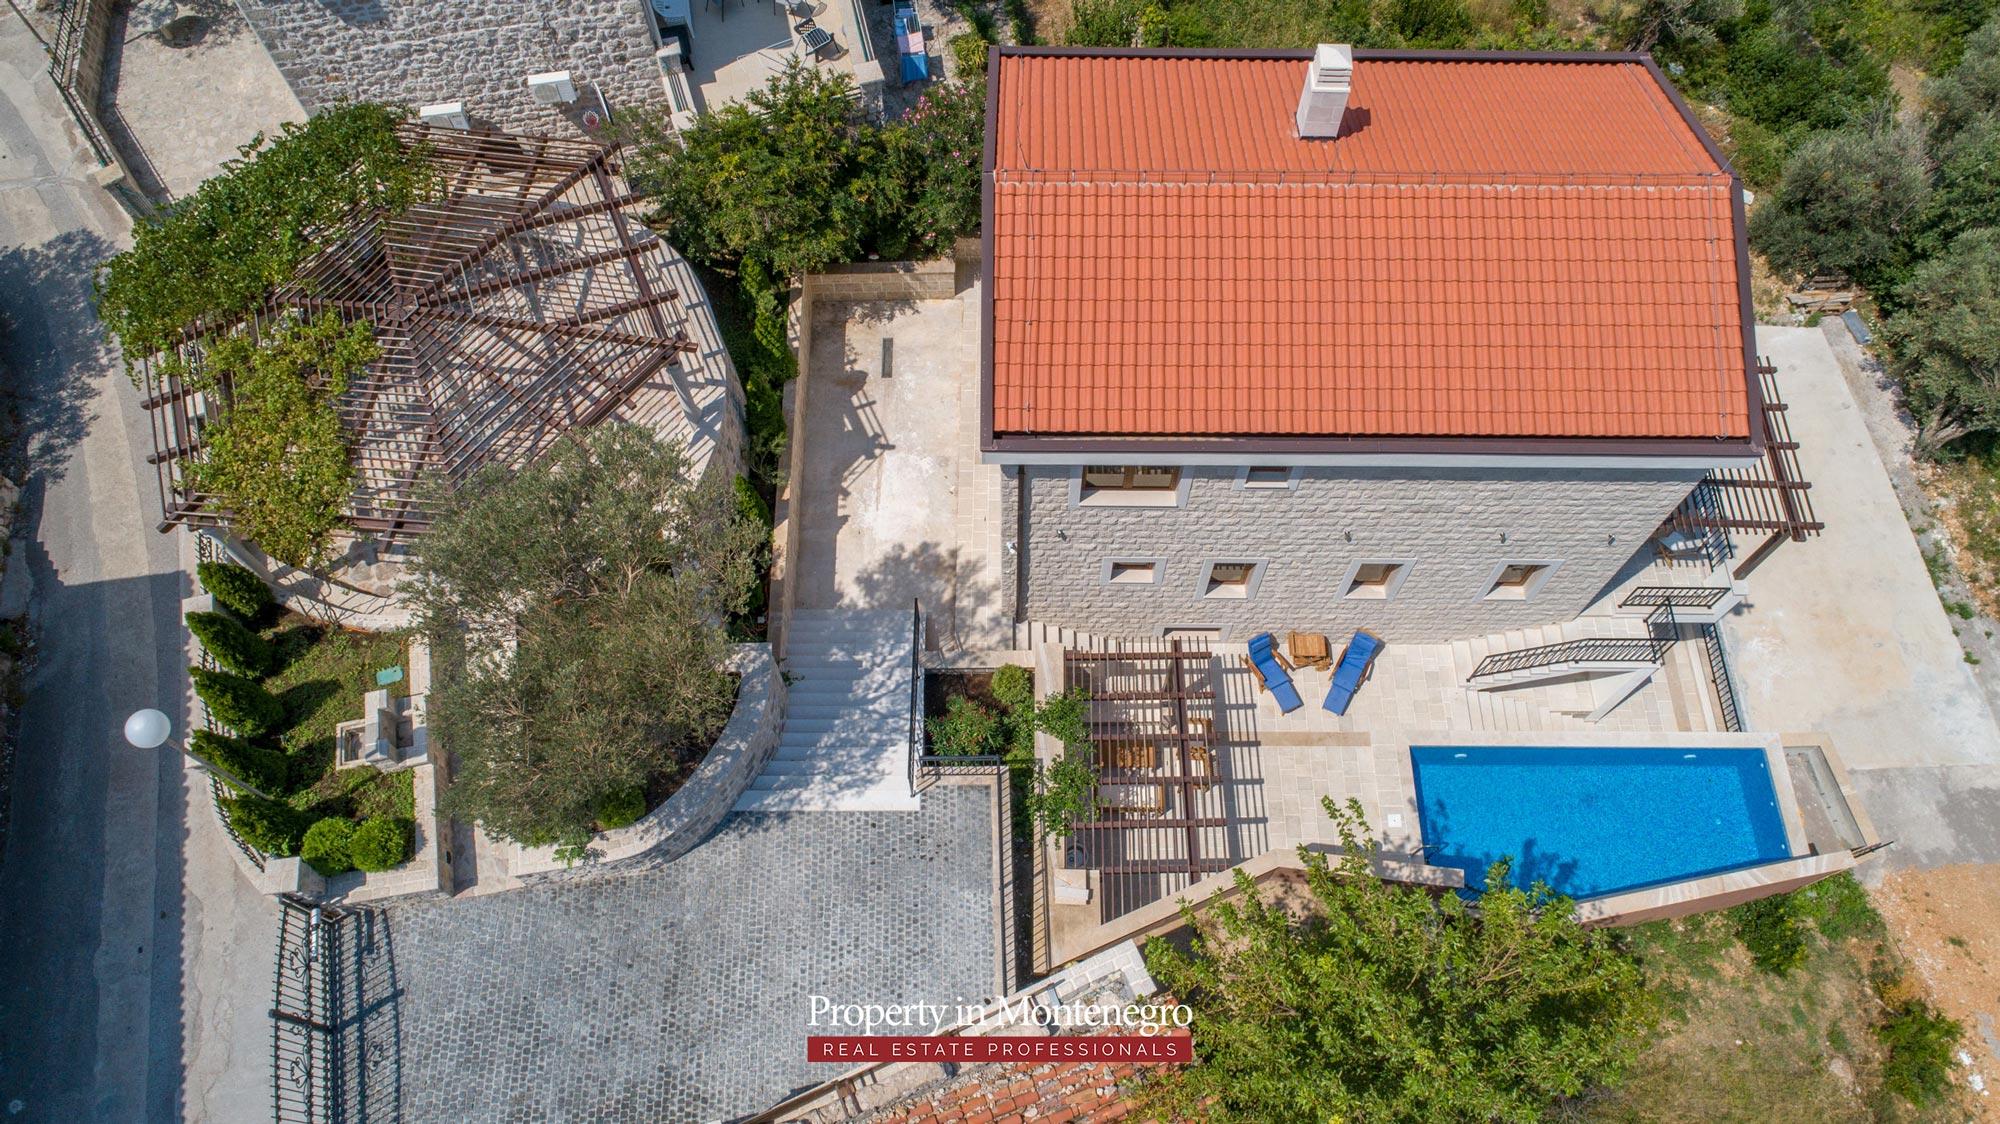 luxury-villa-with-swimming-pool-for-sale-in-Budva (31).jpg